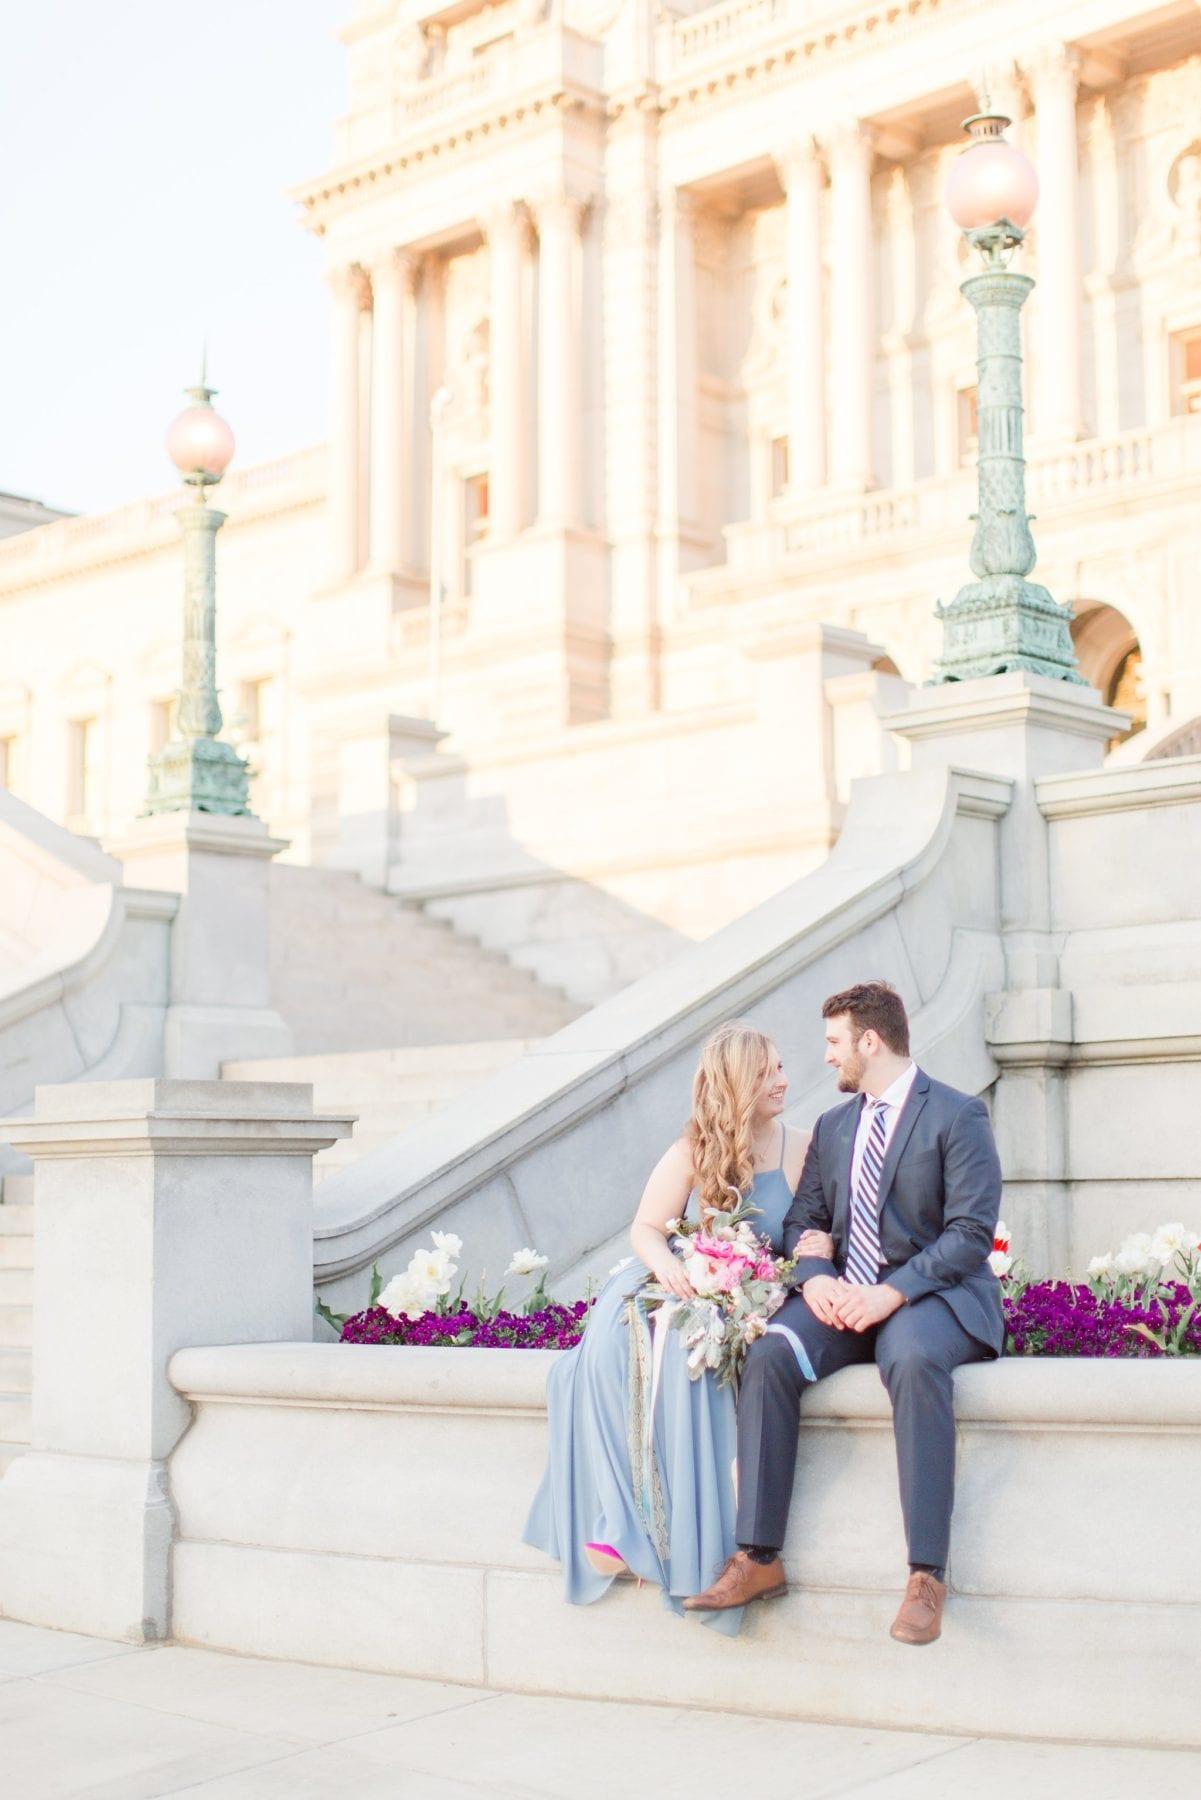 Capitol Hill Engagement Photos Kelly & Zach Washington DC Wedding Photographer Megan Kelsey Photography-261.jpg